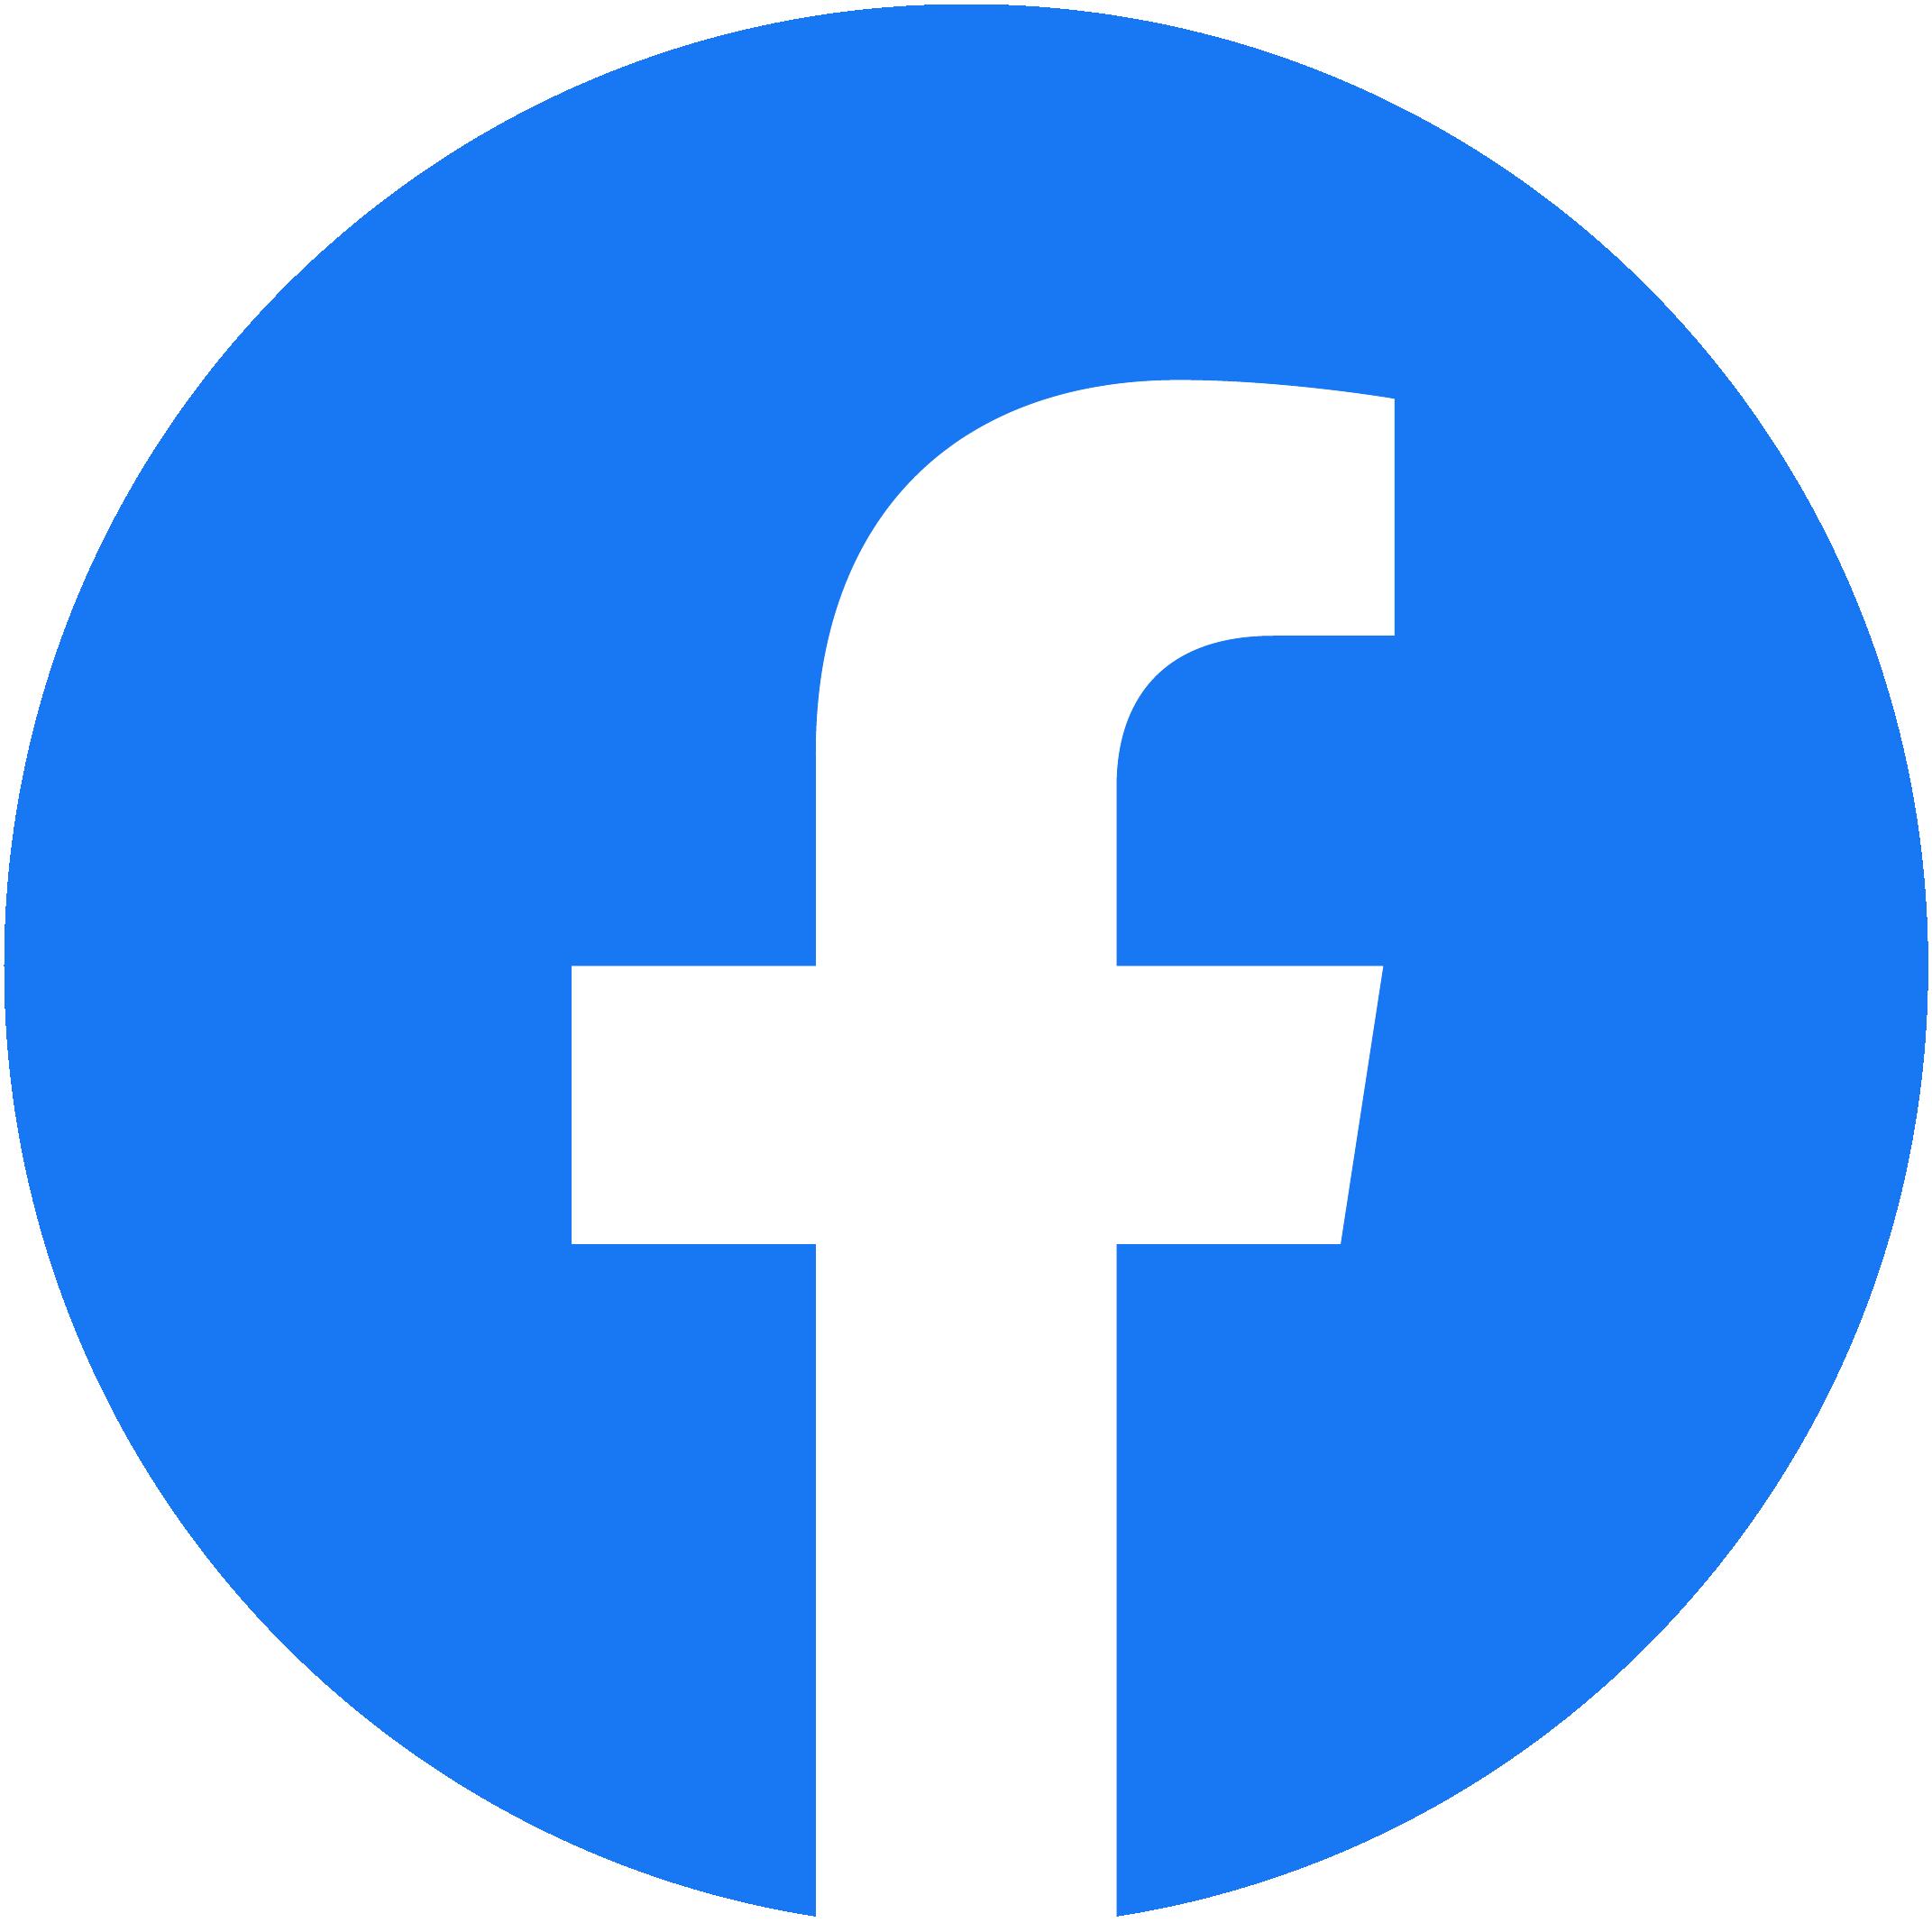 Social Network - เทศบาลเมืองร้อยเอ็ด